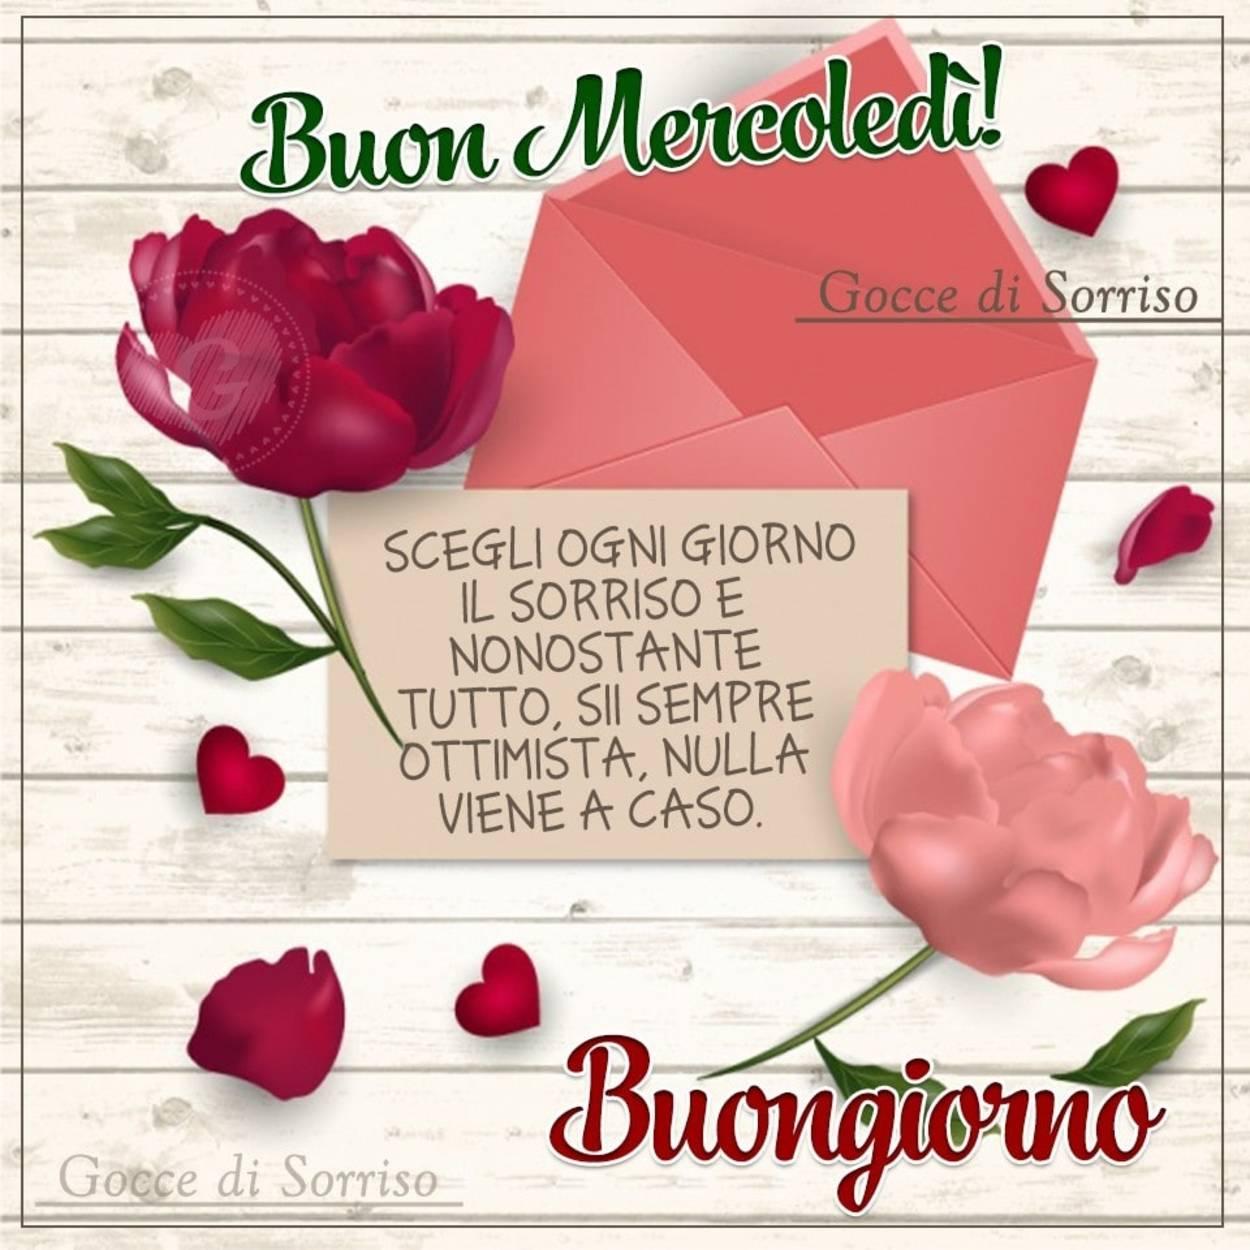 Belle Frasi Del Buon Mercoledi Buongiornoate It